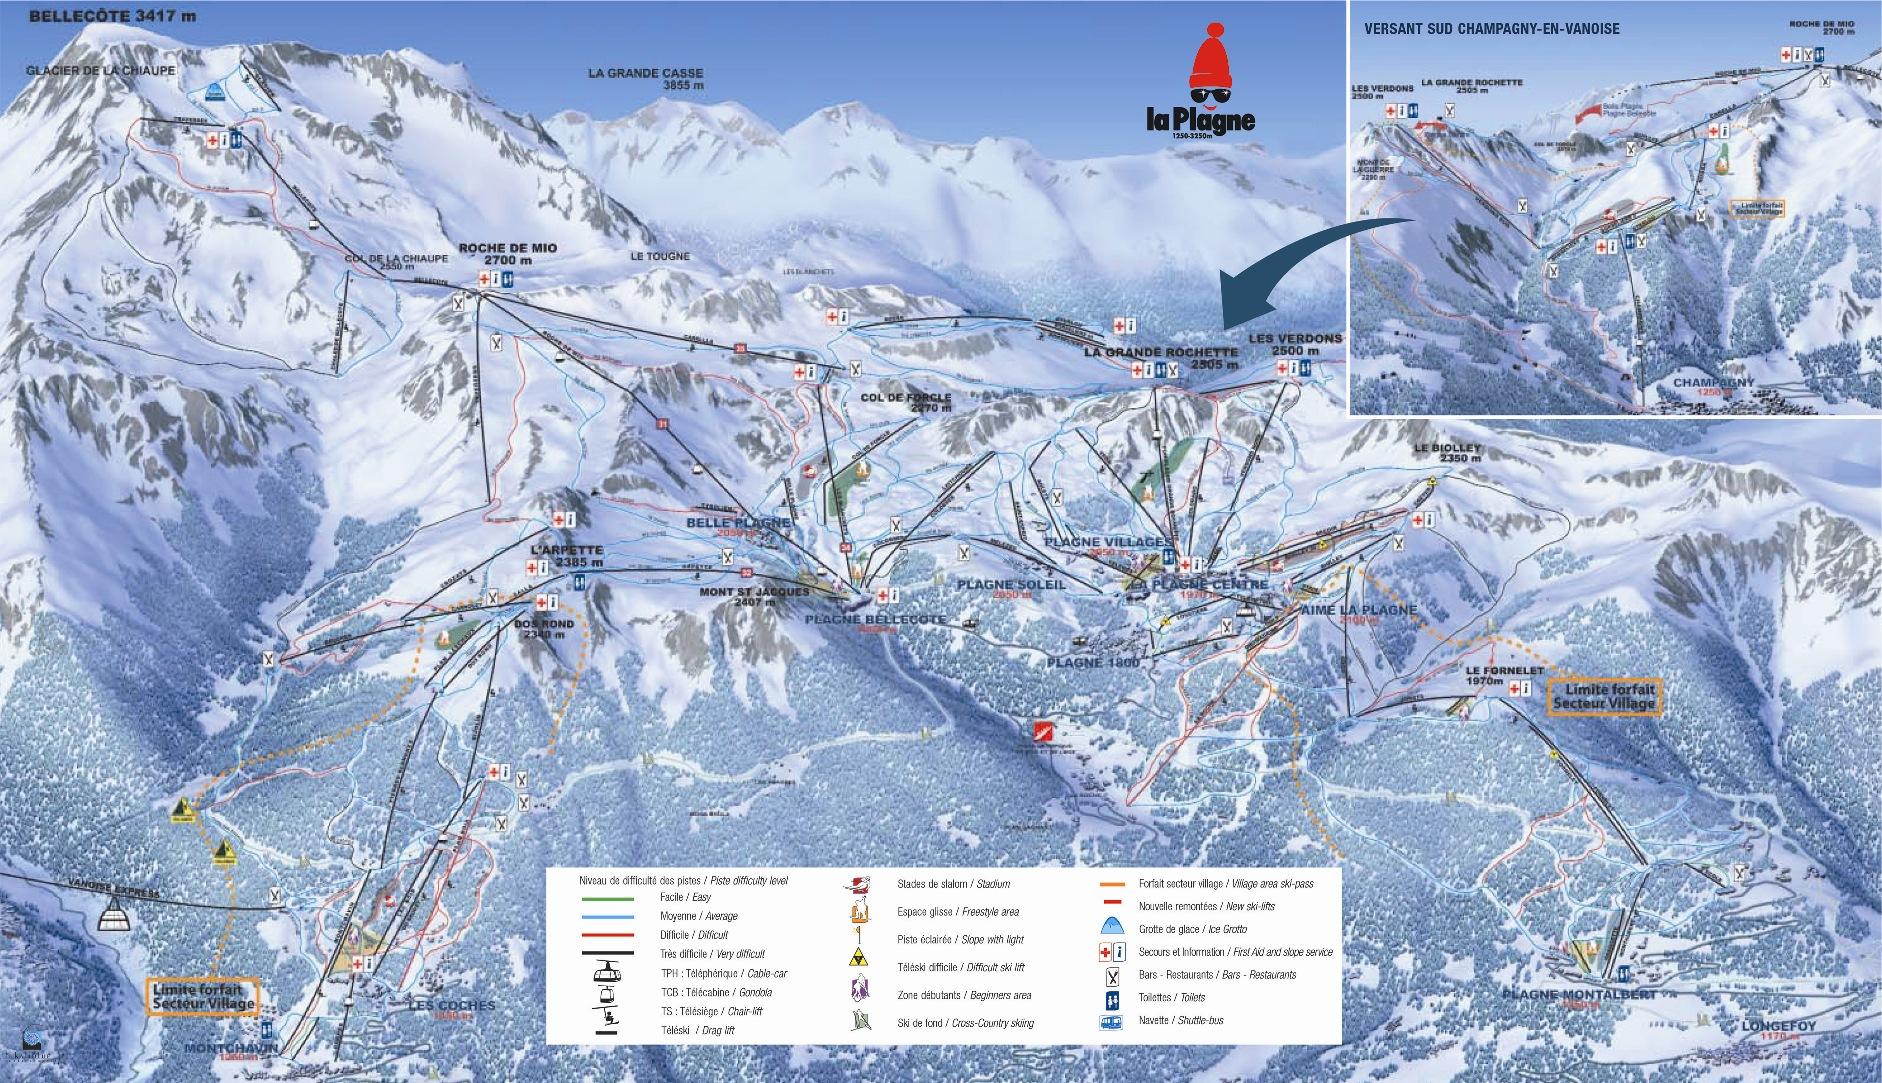 Champagny en vanoise station de ski les stations de ski - Office de tourisme champagny en vanoise ...